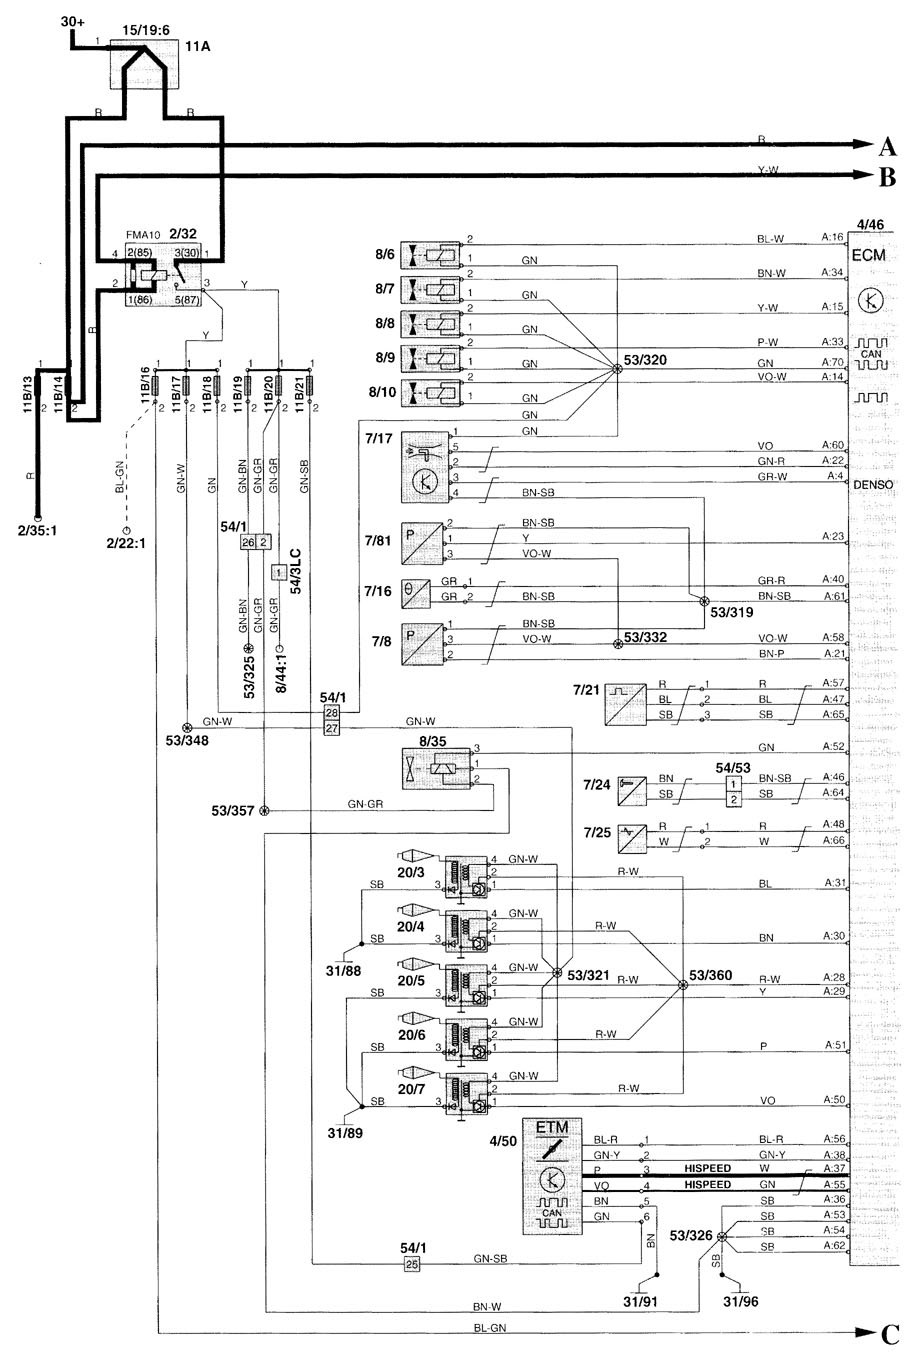 ... Volvo V70 - wiring diagram - fuel control (part 2)